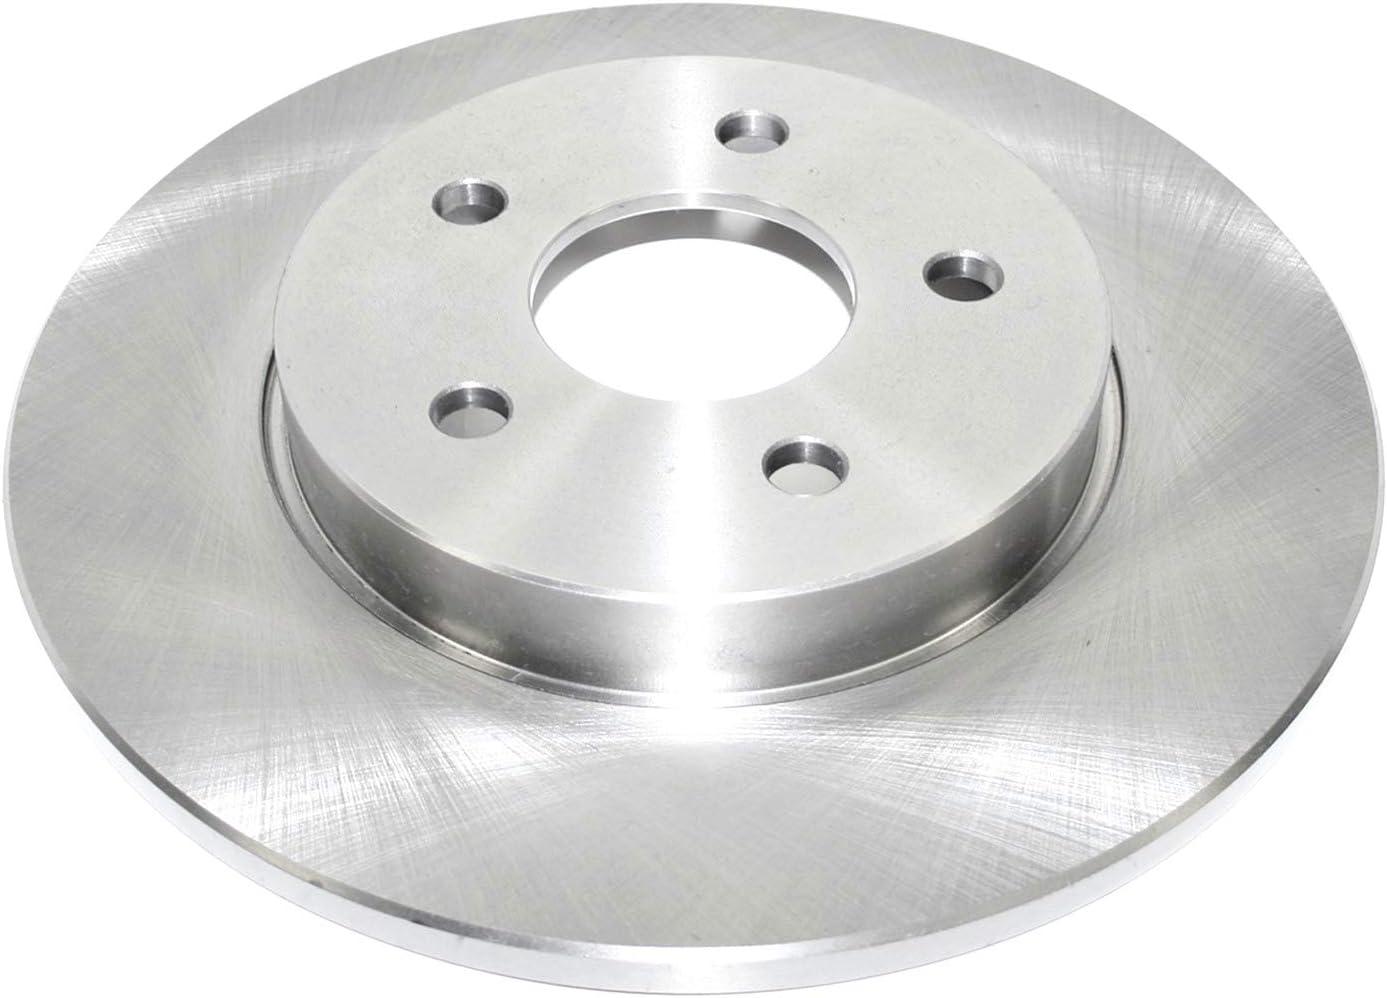 DuraGo Super intense Industry No. 1 SALE BR34252 Rear Solid Rotor Brake Disc